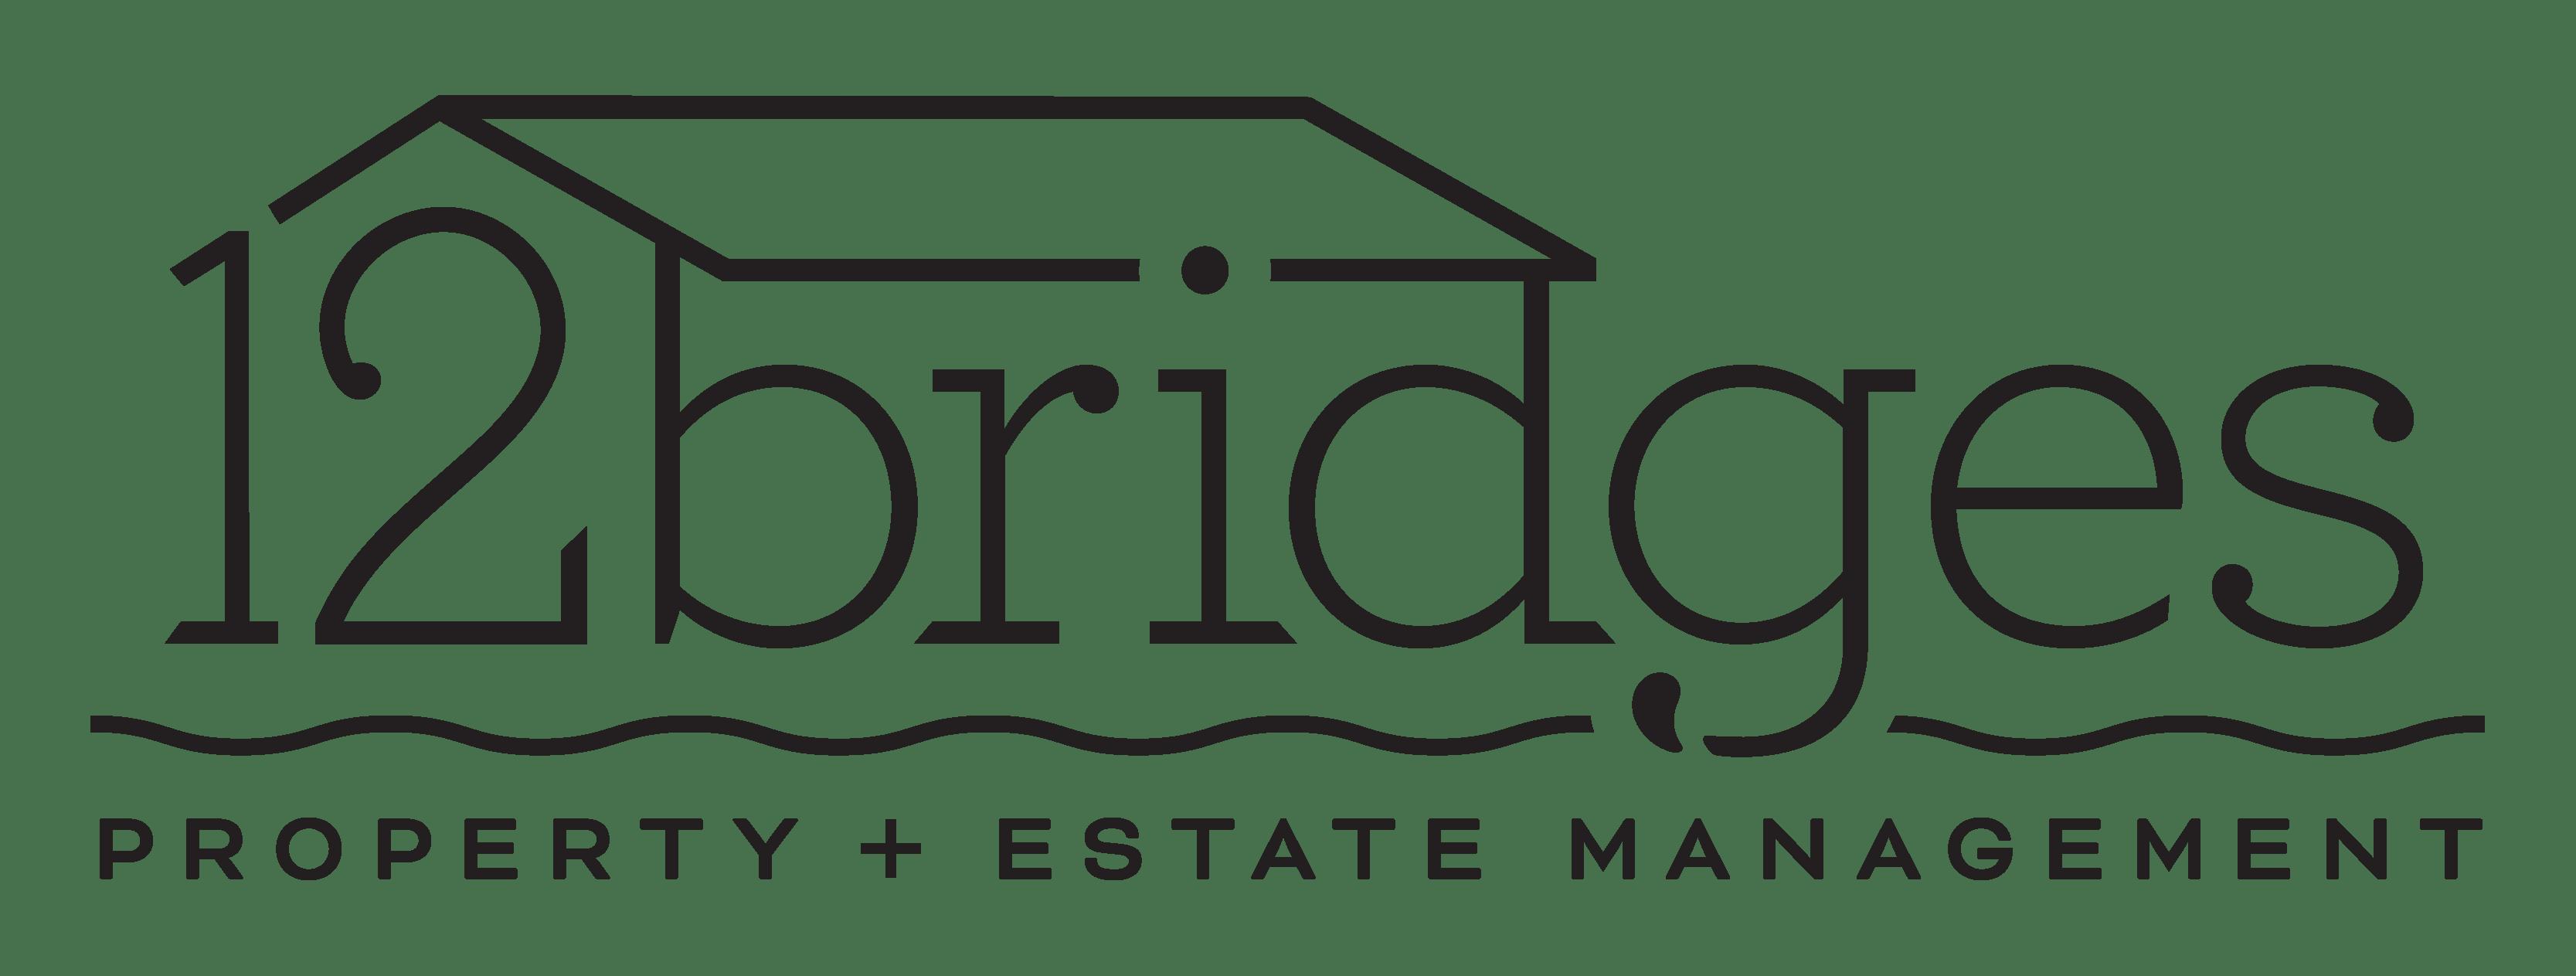 12 Bridges Property Estate management logo